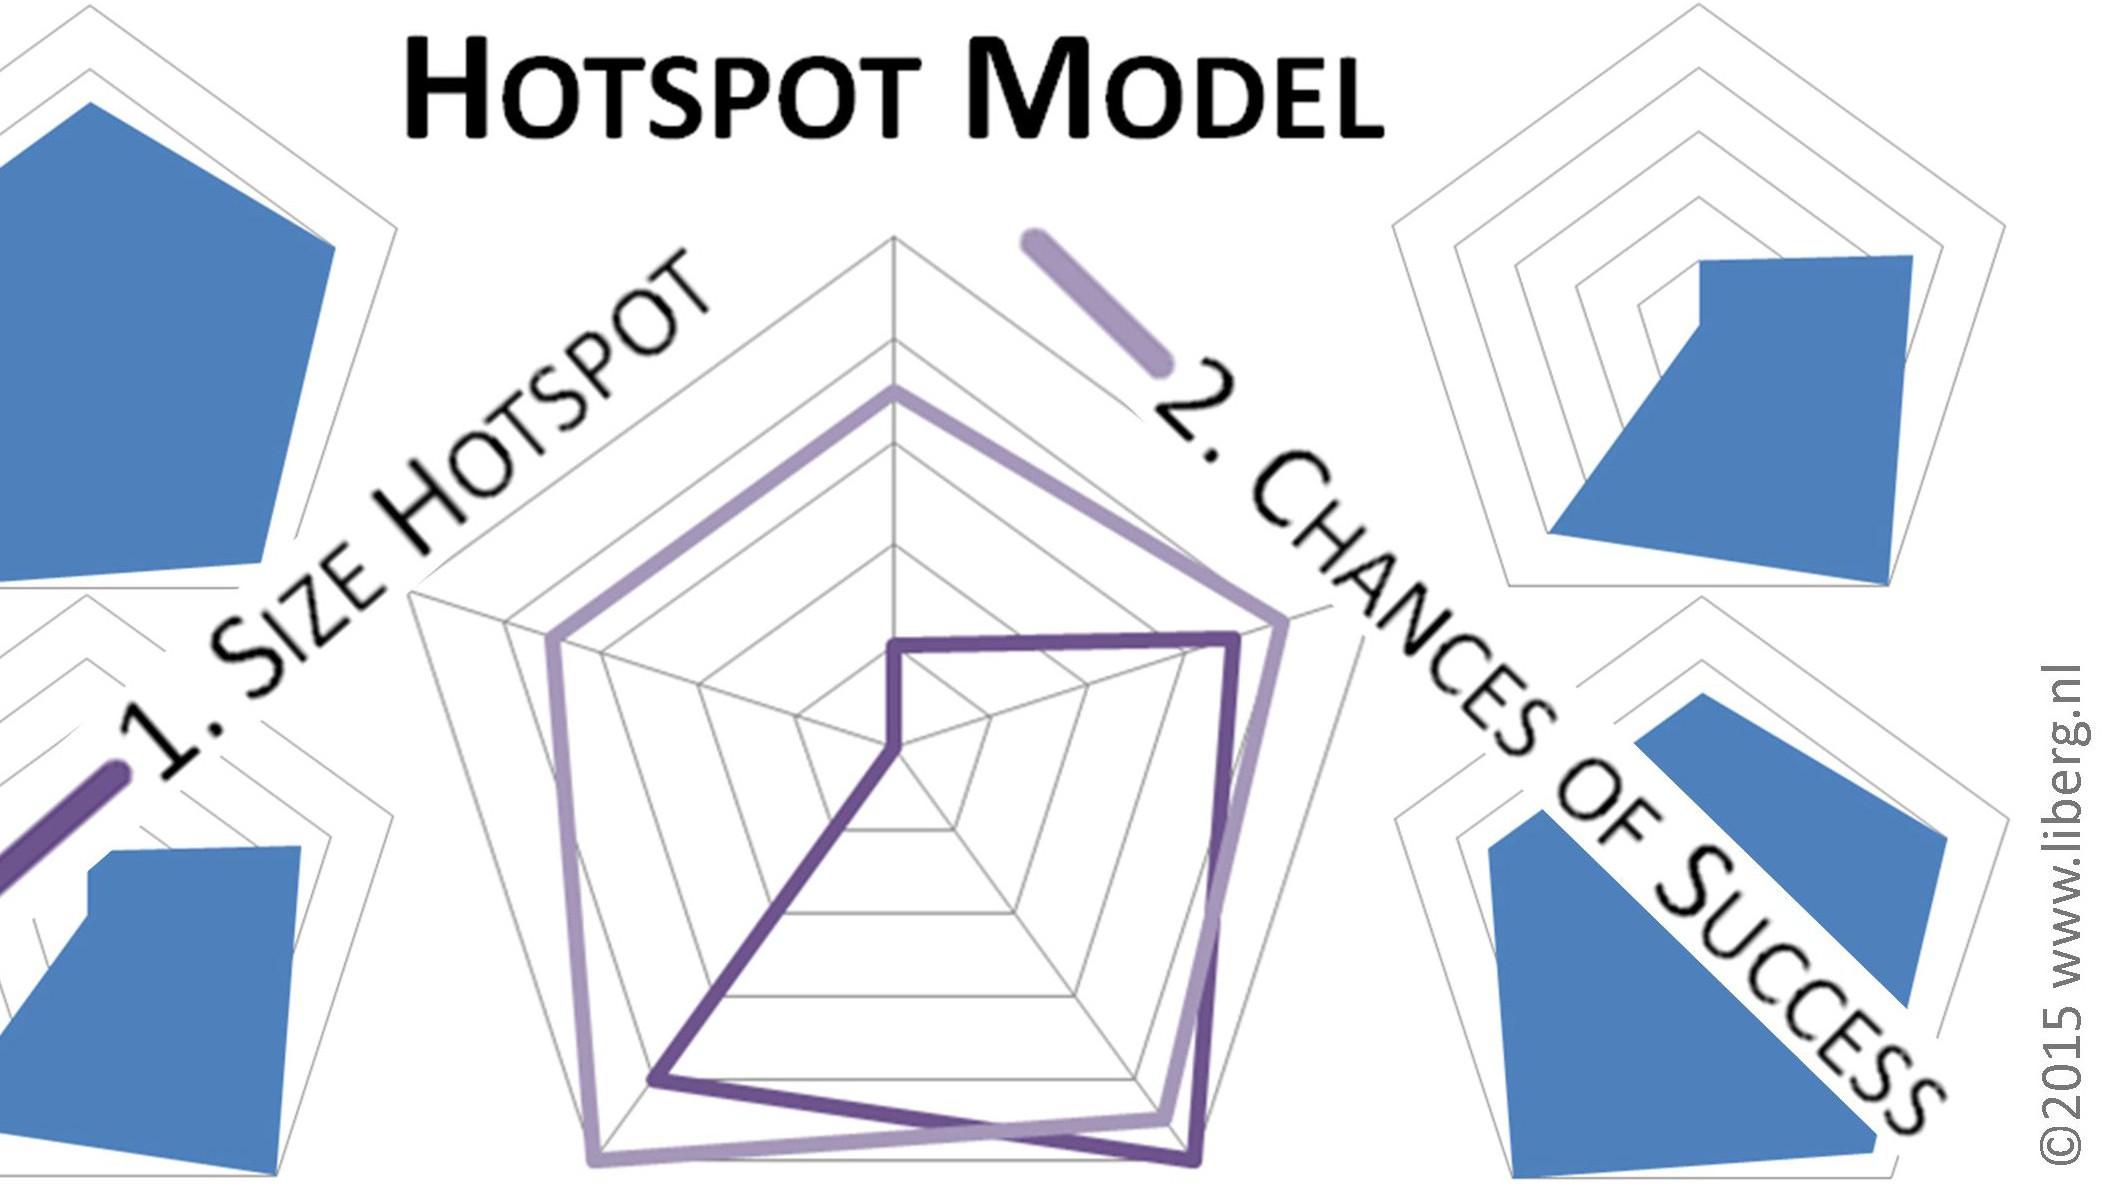 hotspot model